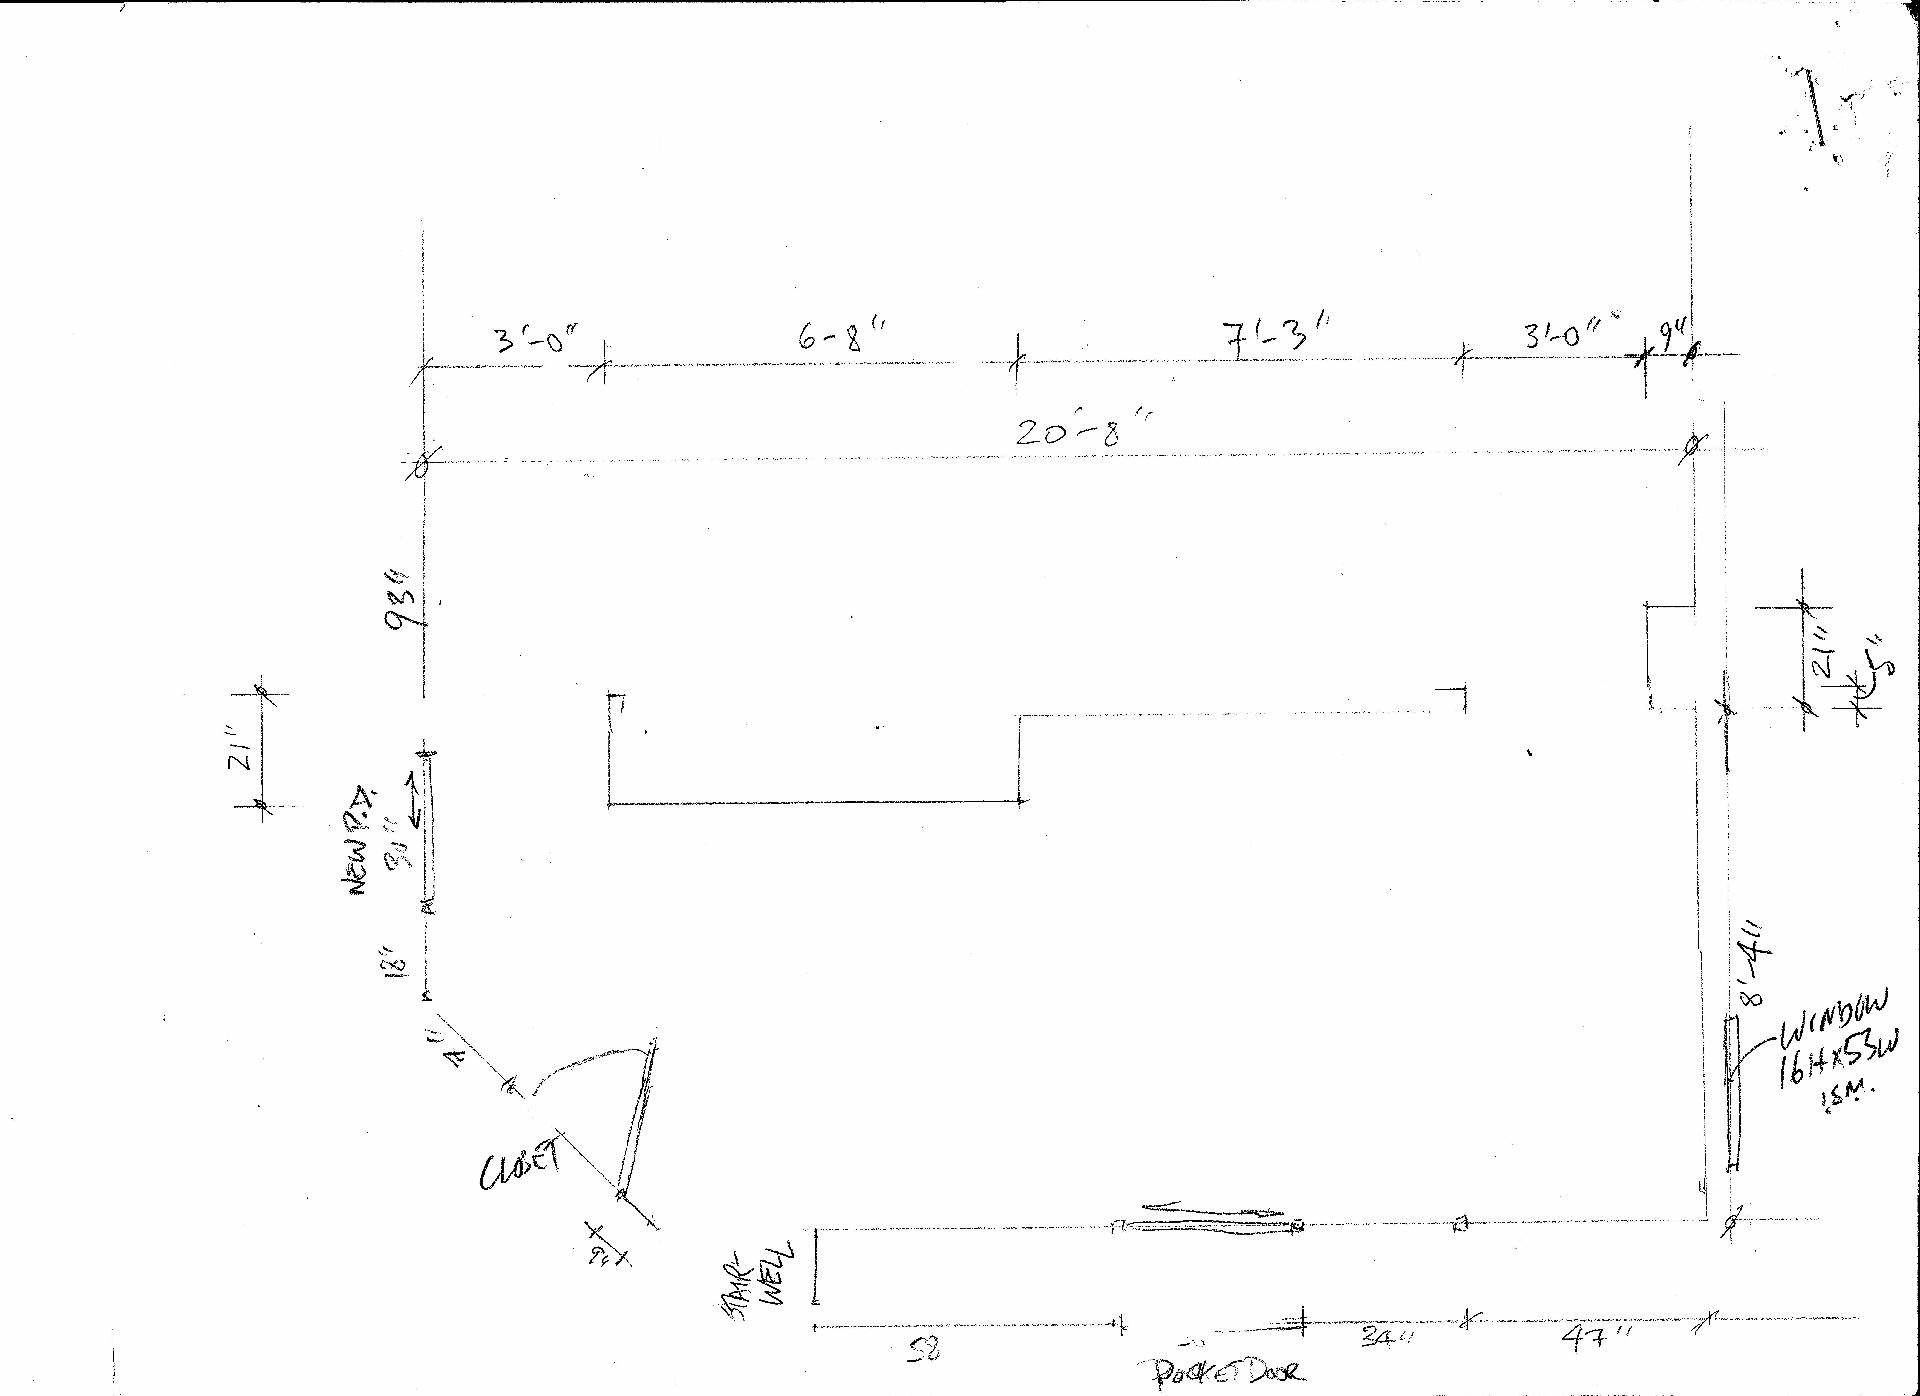 Basement millwork plan